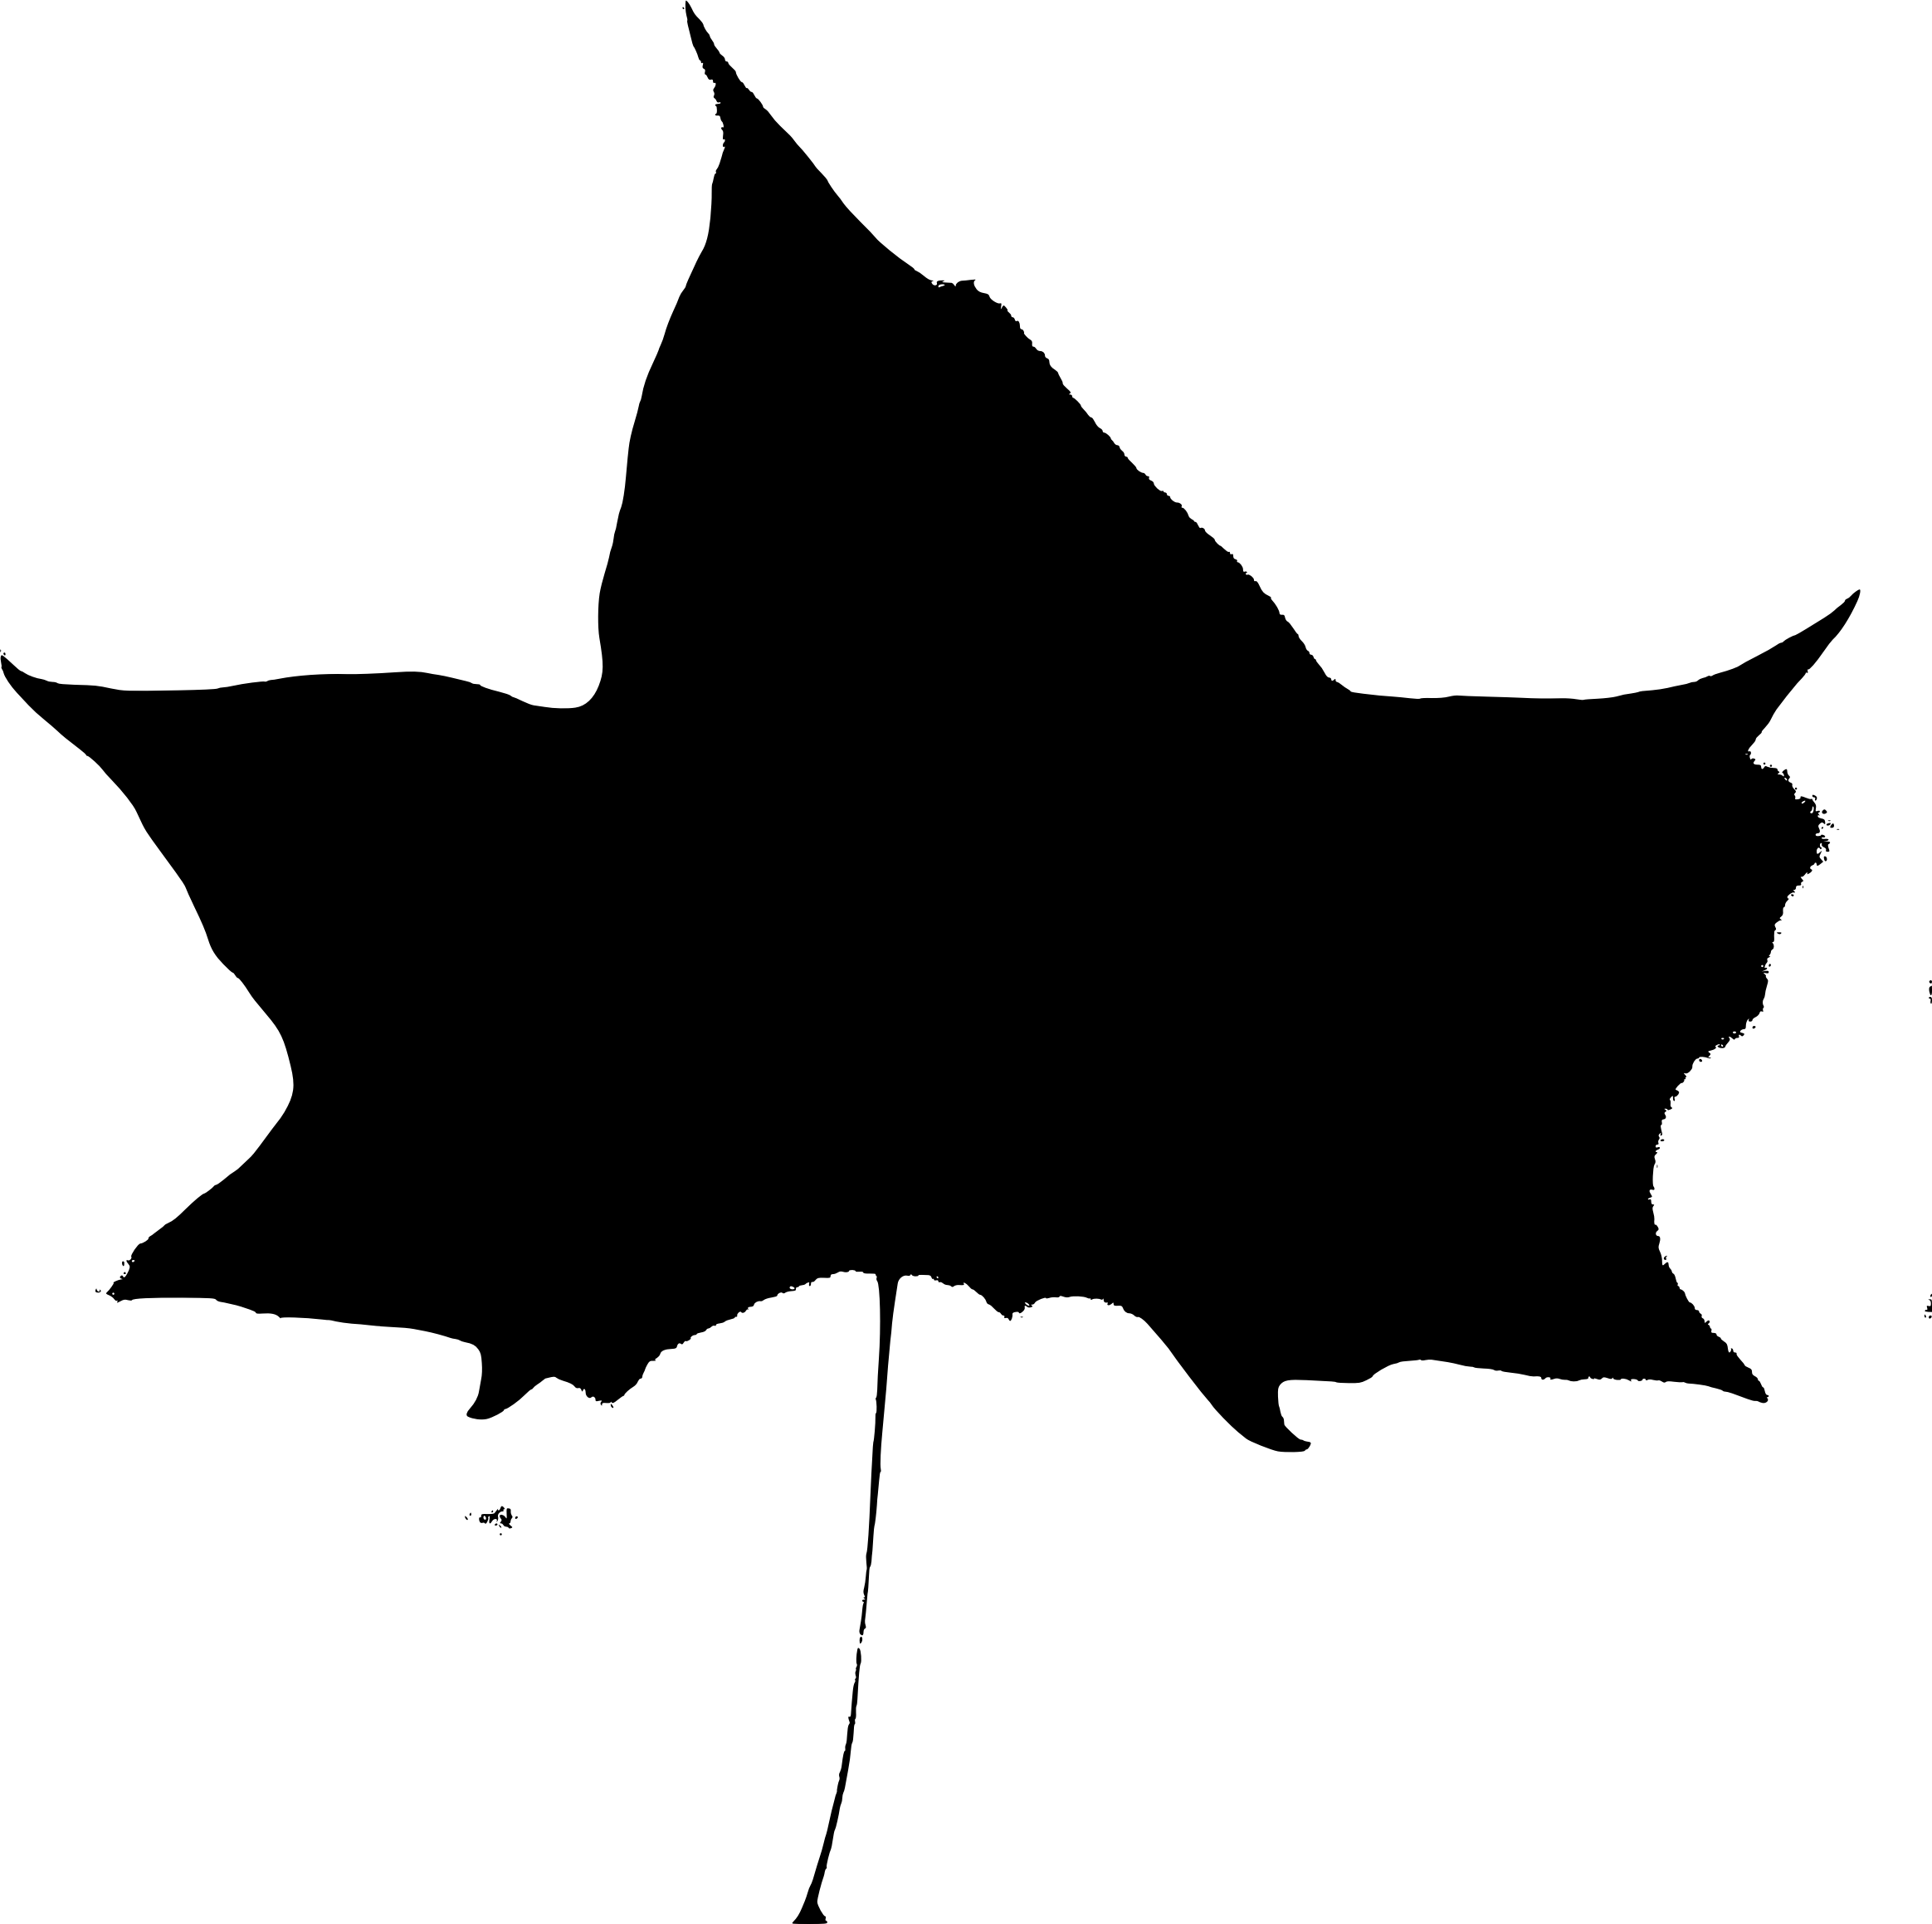 Fall beijing leaves black. Clipart plane stencil